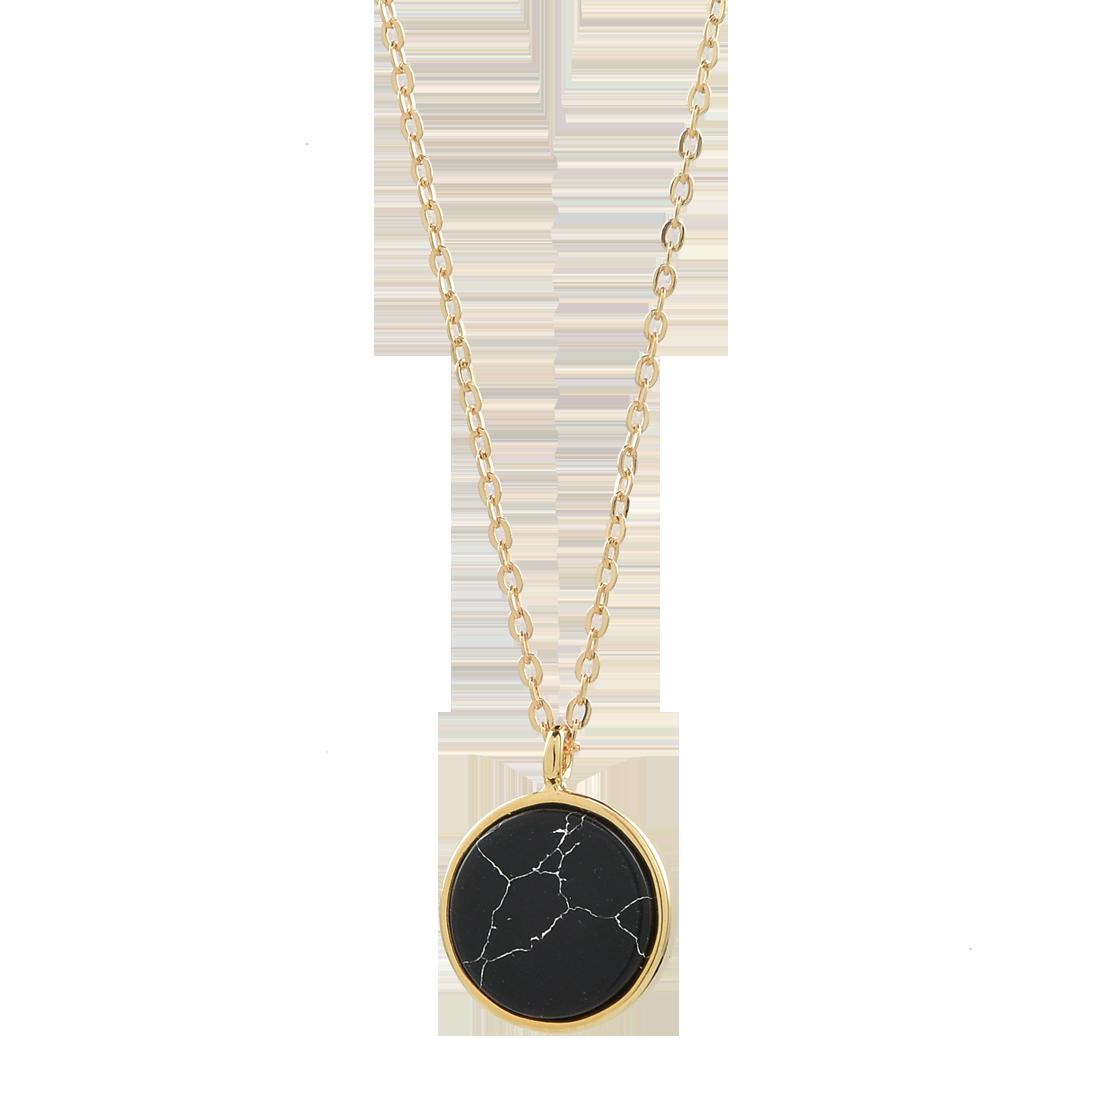 Disc smart ideas marble. Necklace clipart cute necklace